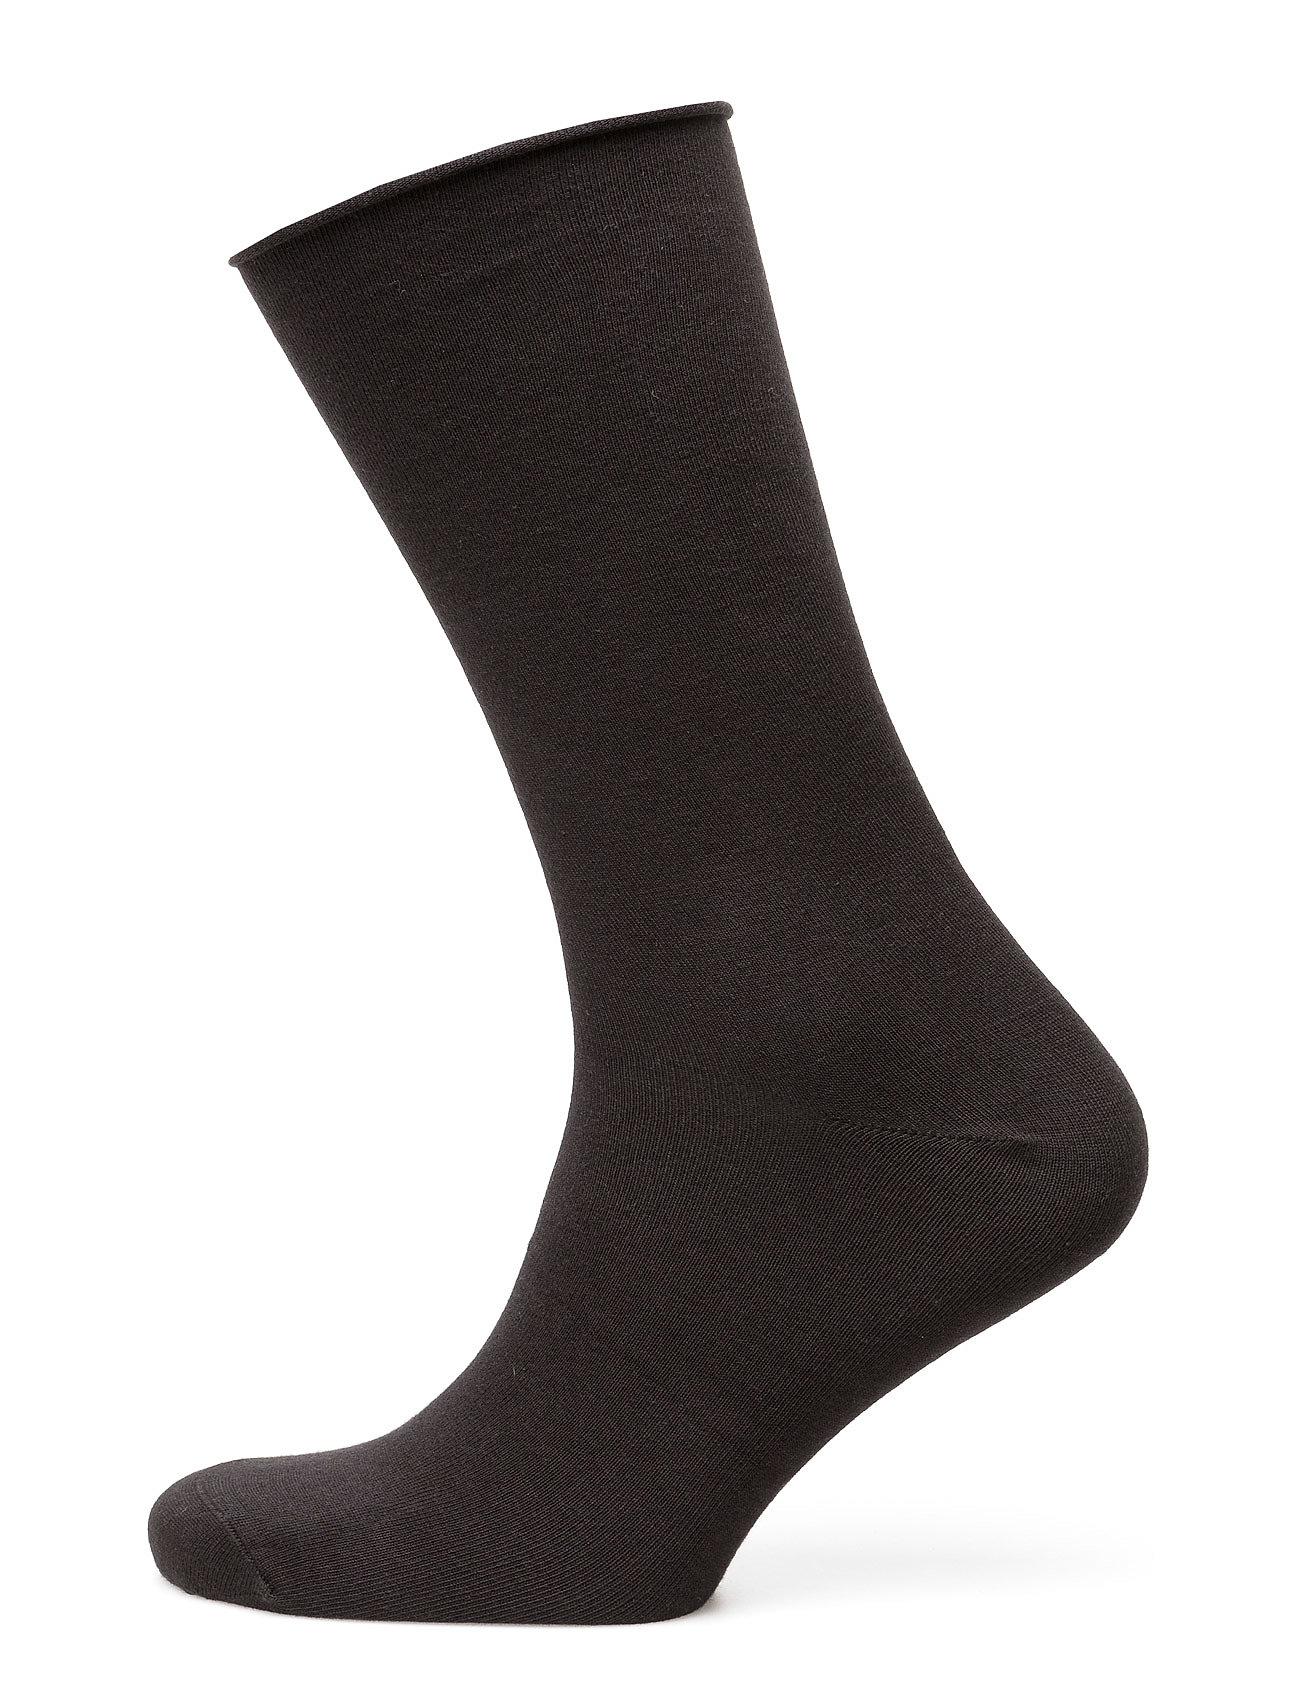 Decoy Ladies thin ankle sock